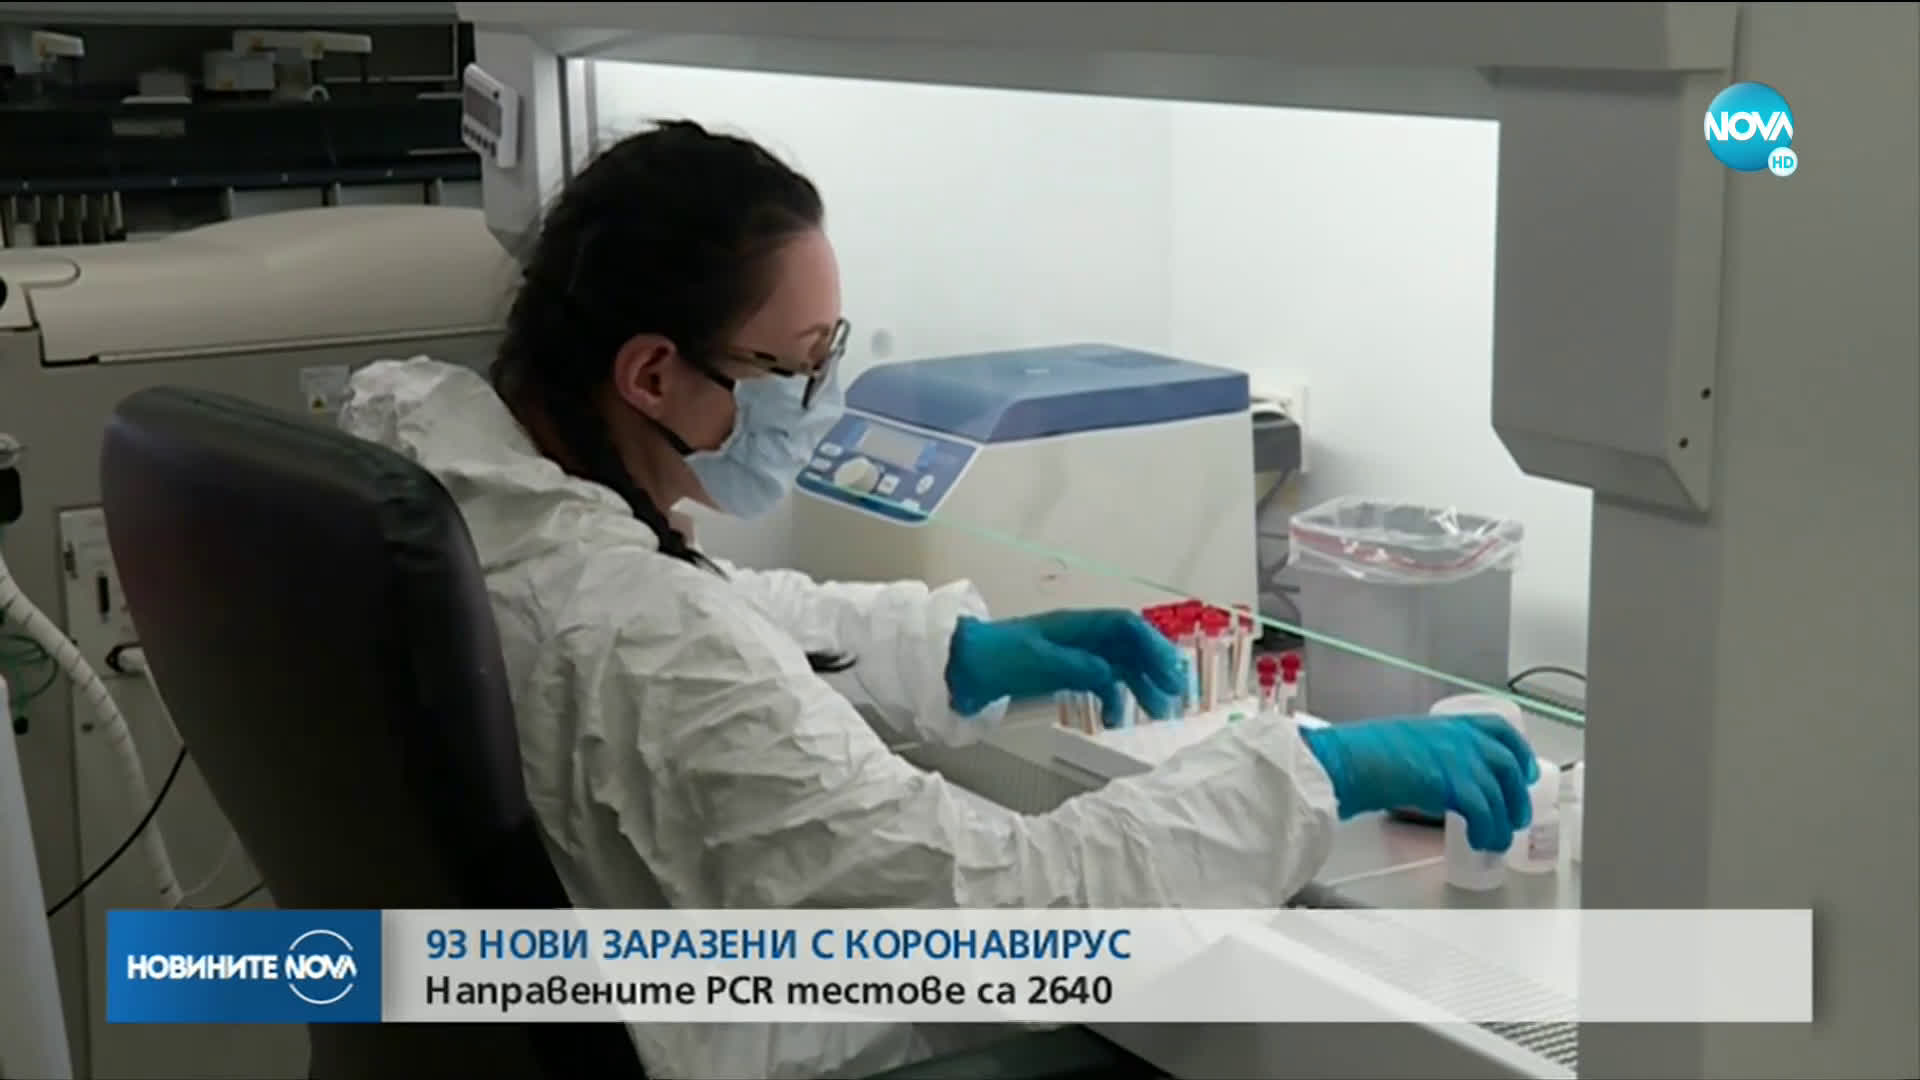 Нови 93 случая на коронавируса у нас